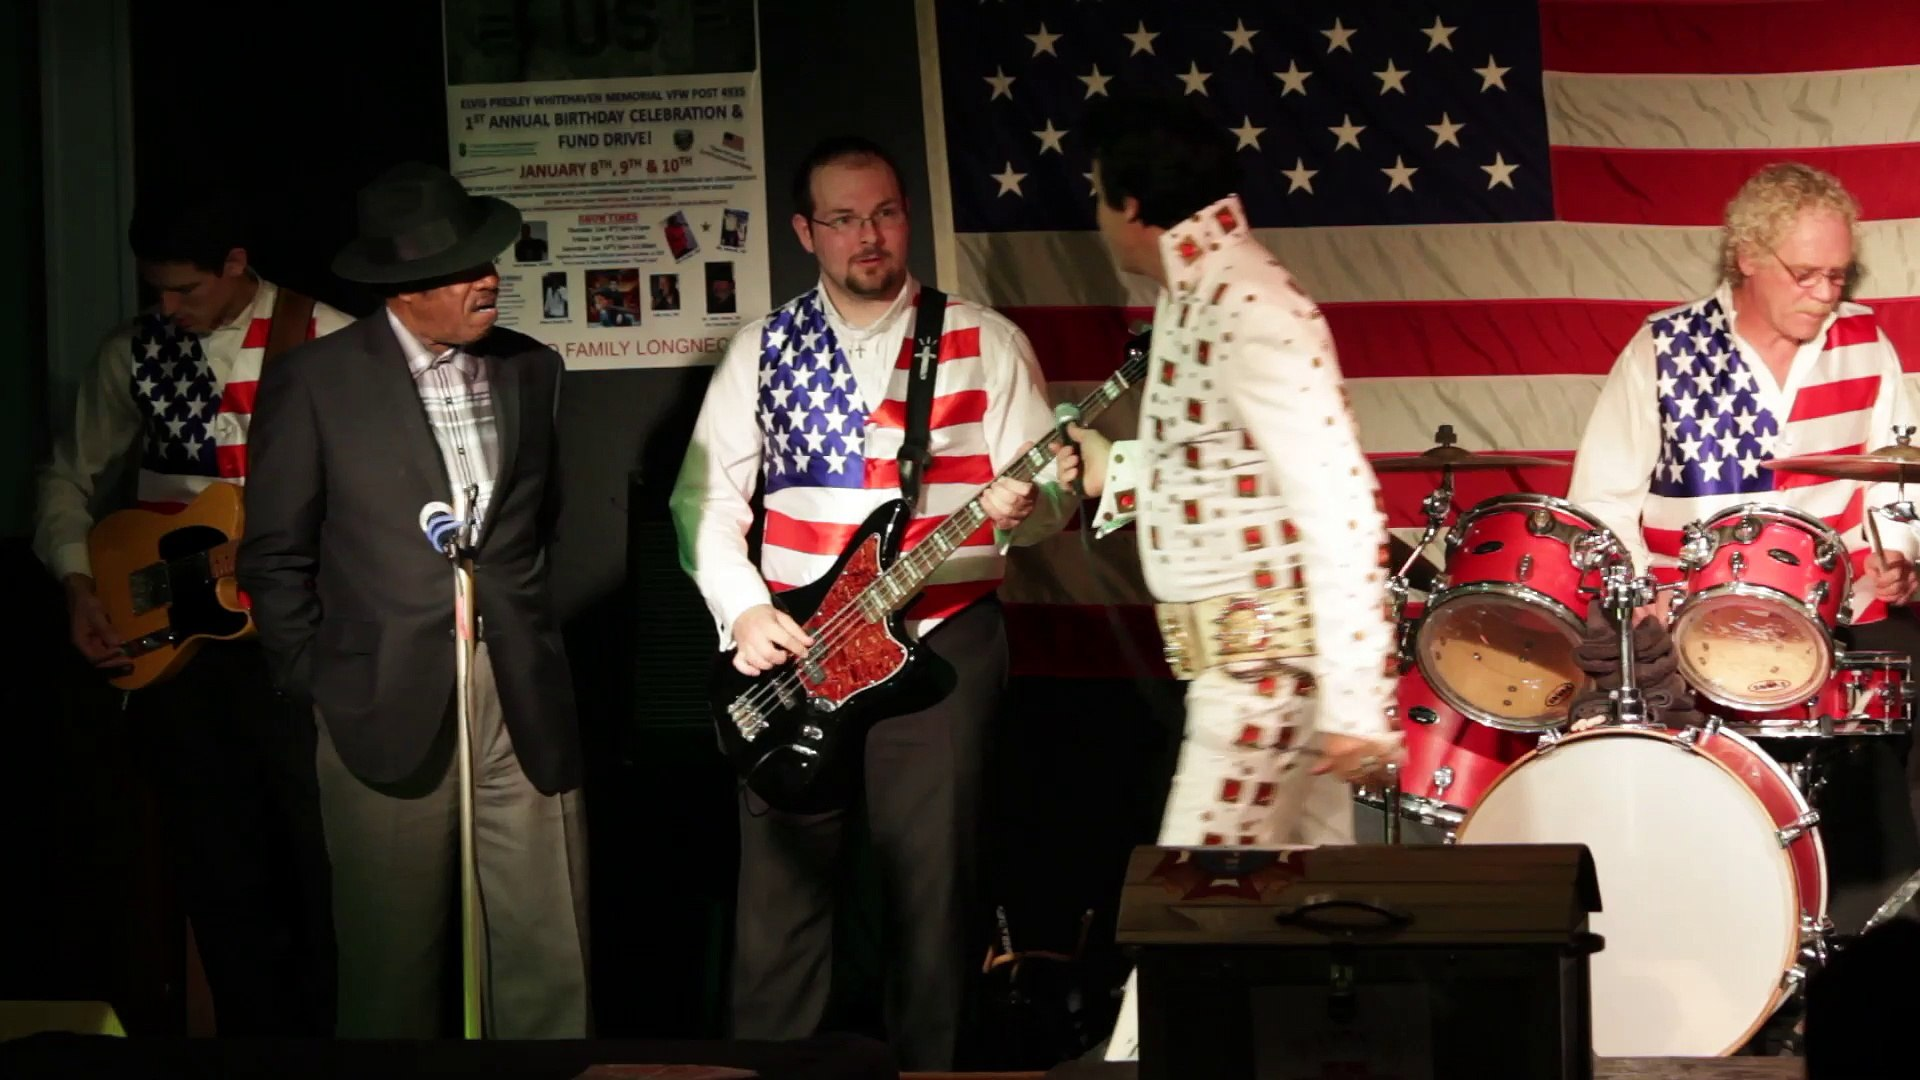 Todd Herendeen and Ben Cauley perform 'Polk Salad Annie' Elvis Presley Memorial VFW 2015